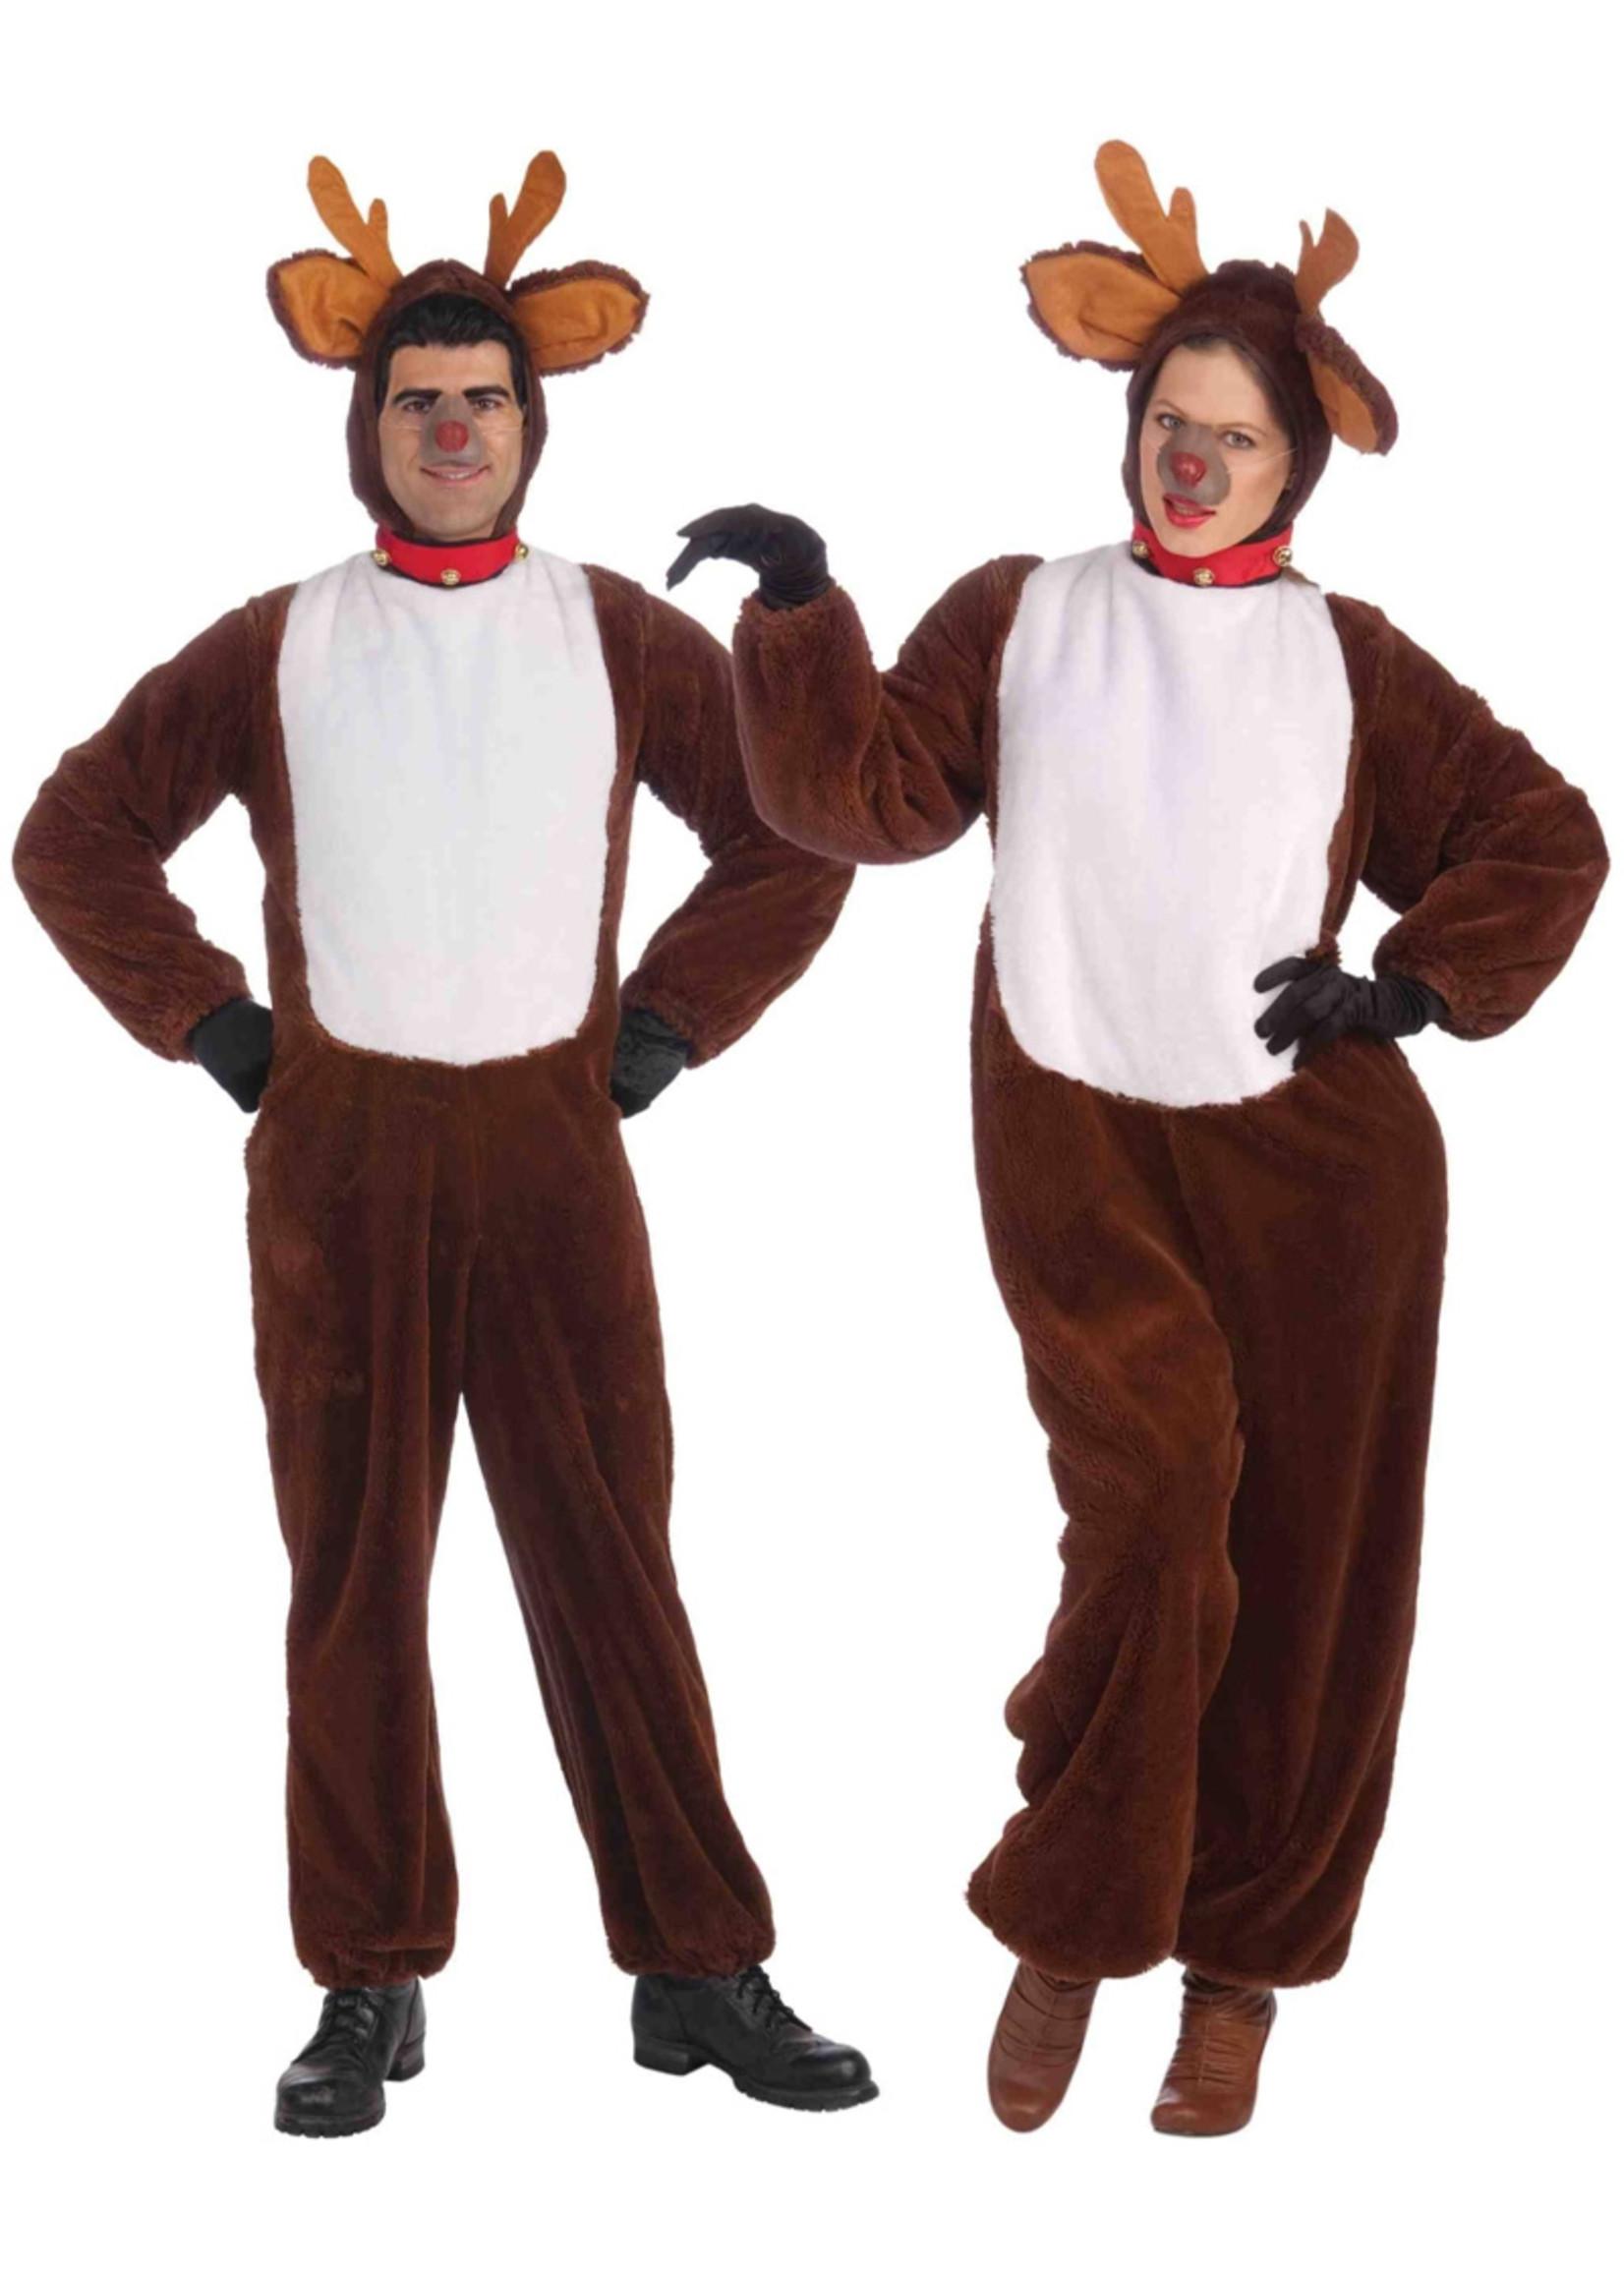 FORUM NOVELTIES Plush Reindeer Costume - Women's